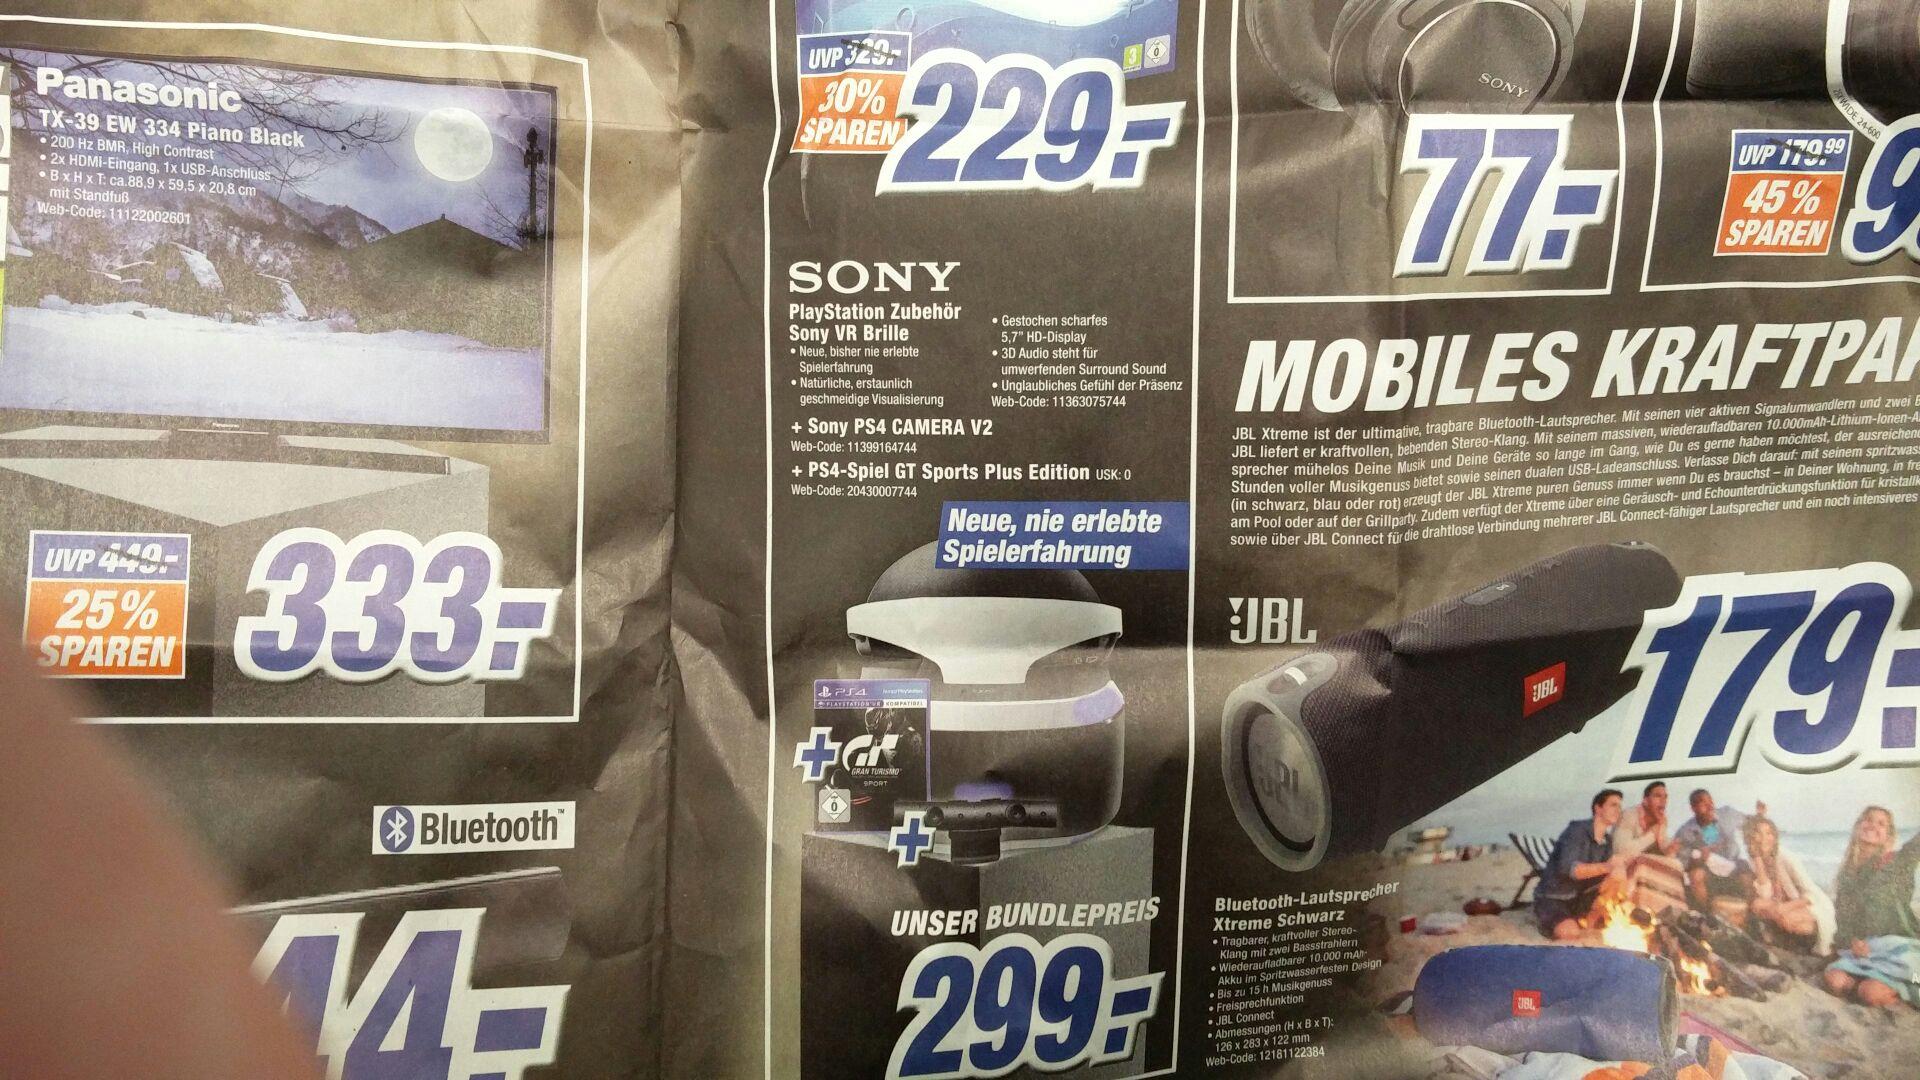 PSVR+Gt Sport +Camera v2=299€